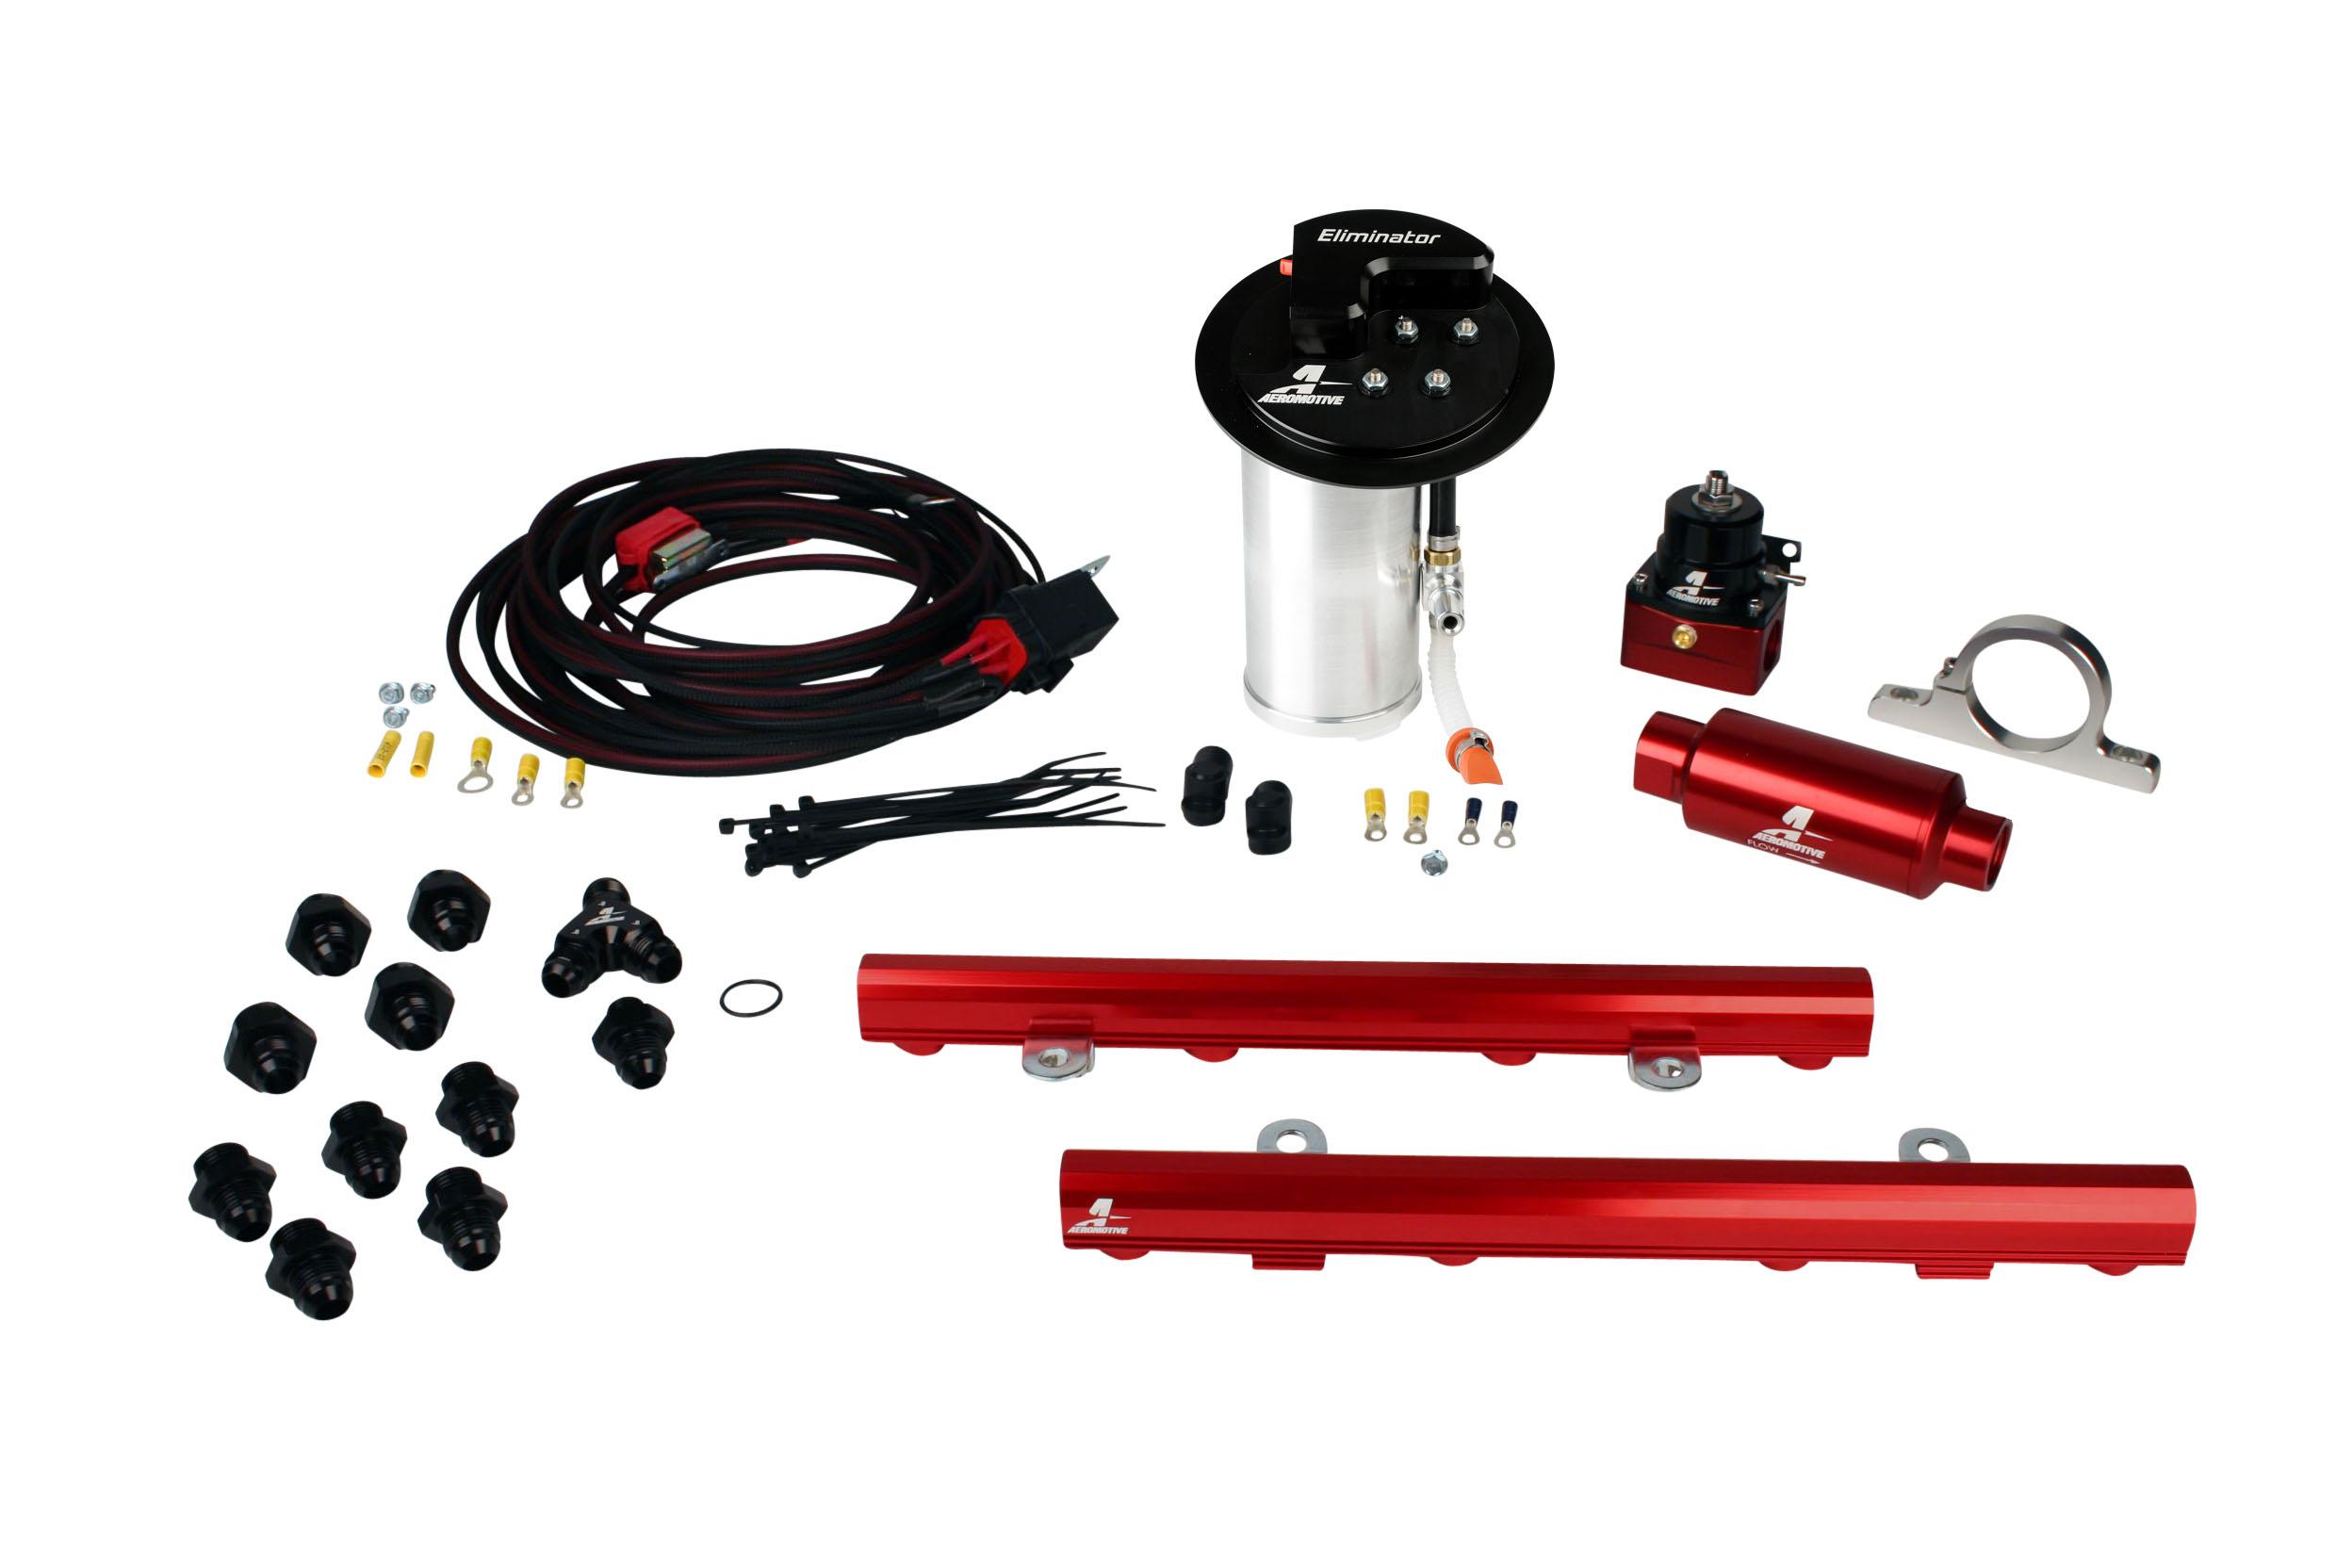 10 17 Mustang Gt Stealth Eliminator Race System With 50l 4 V Fuel 03 Filter Rails